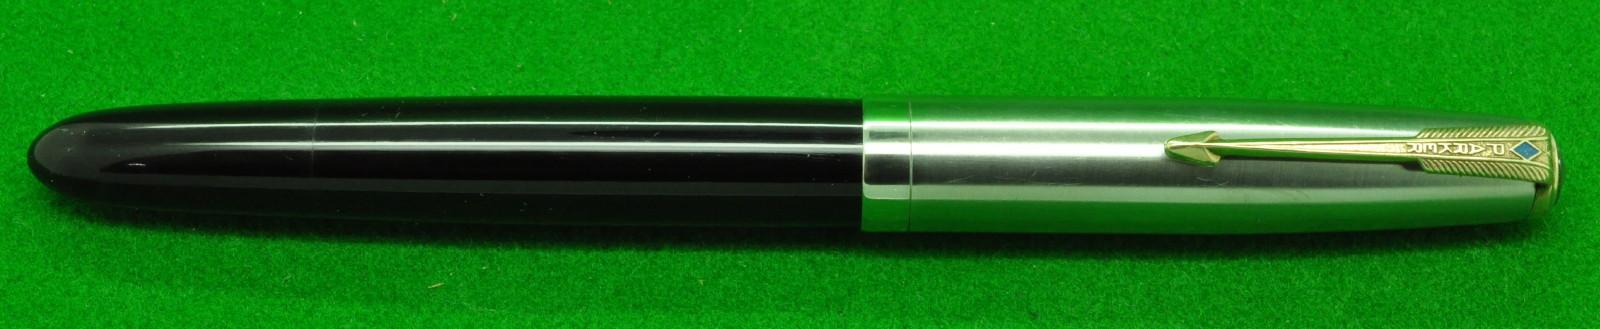 Parker 51 Clutch Pencil c1950 Vintage Forest Green with Lustraloy